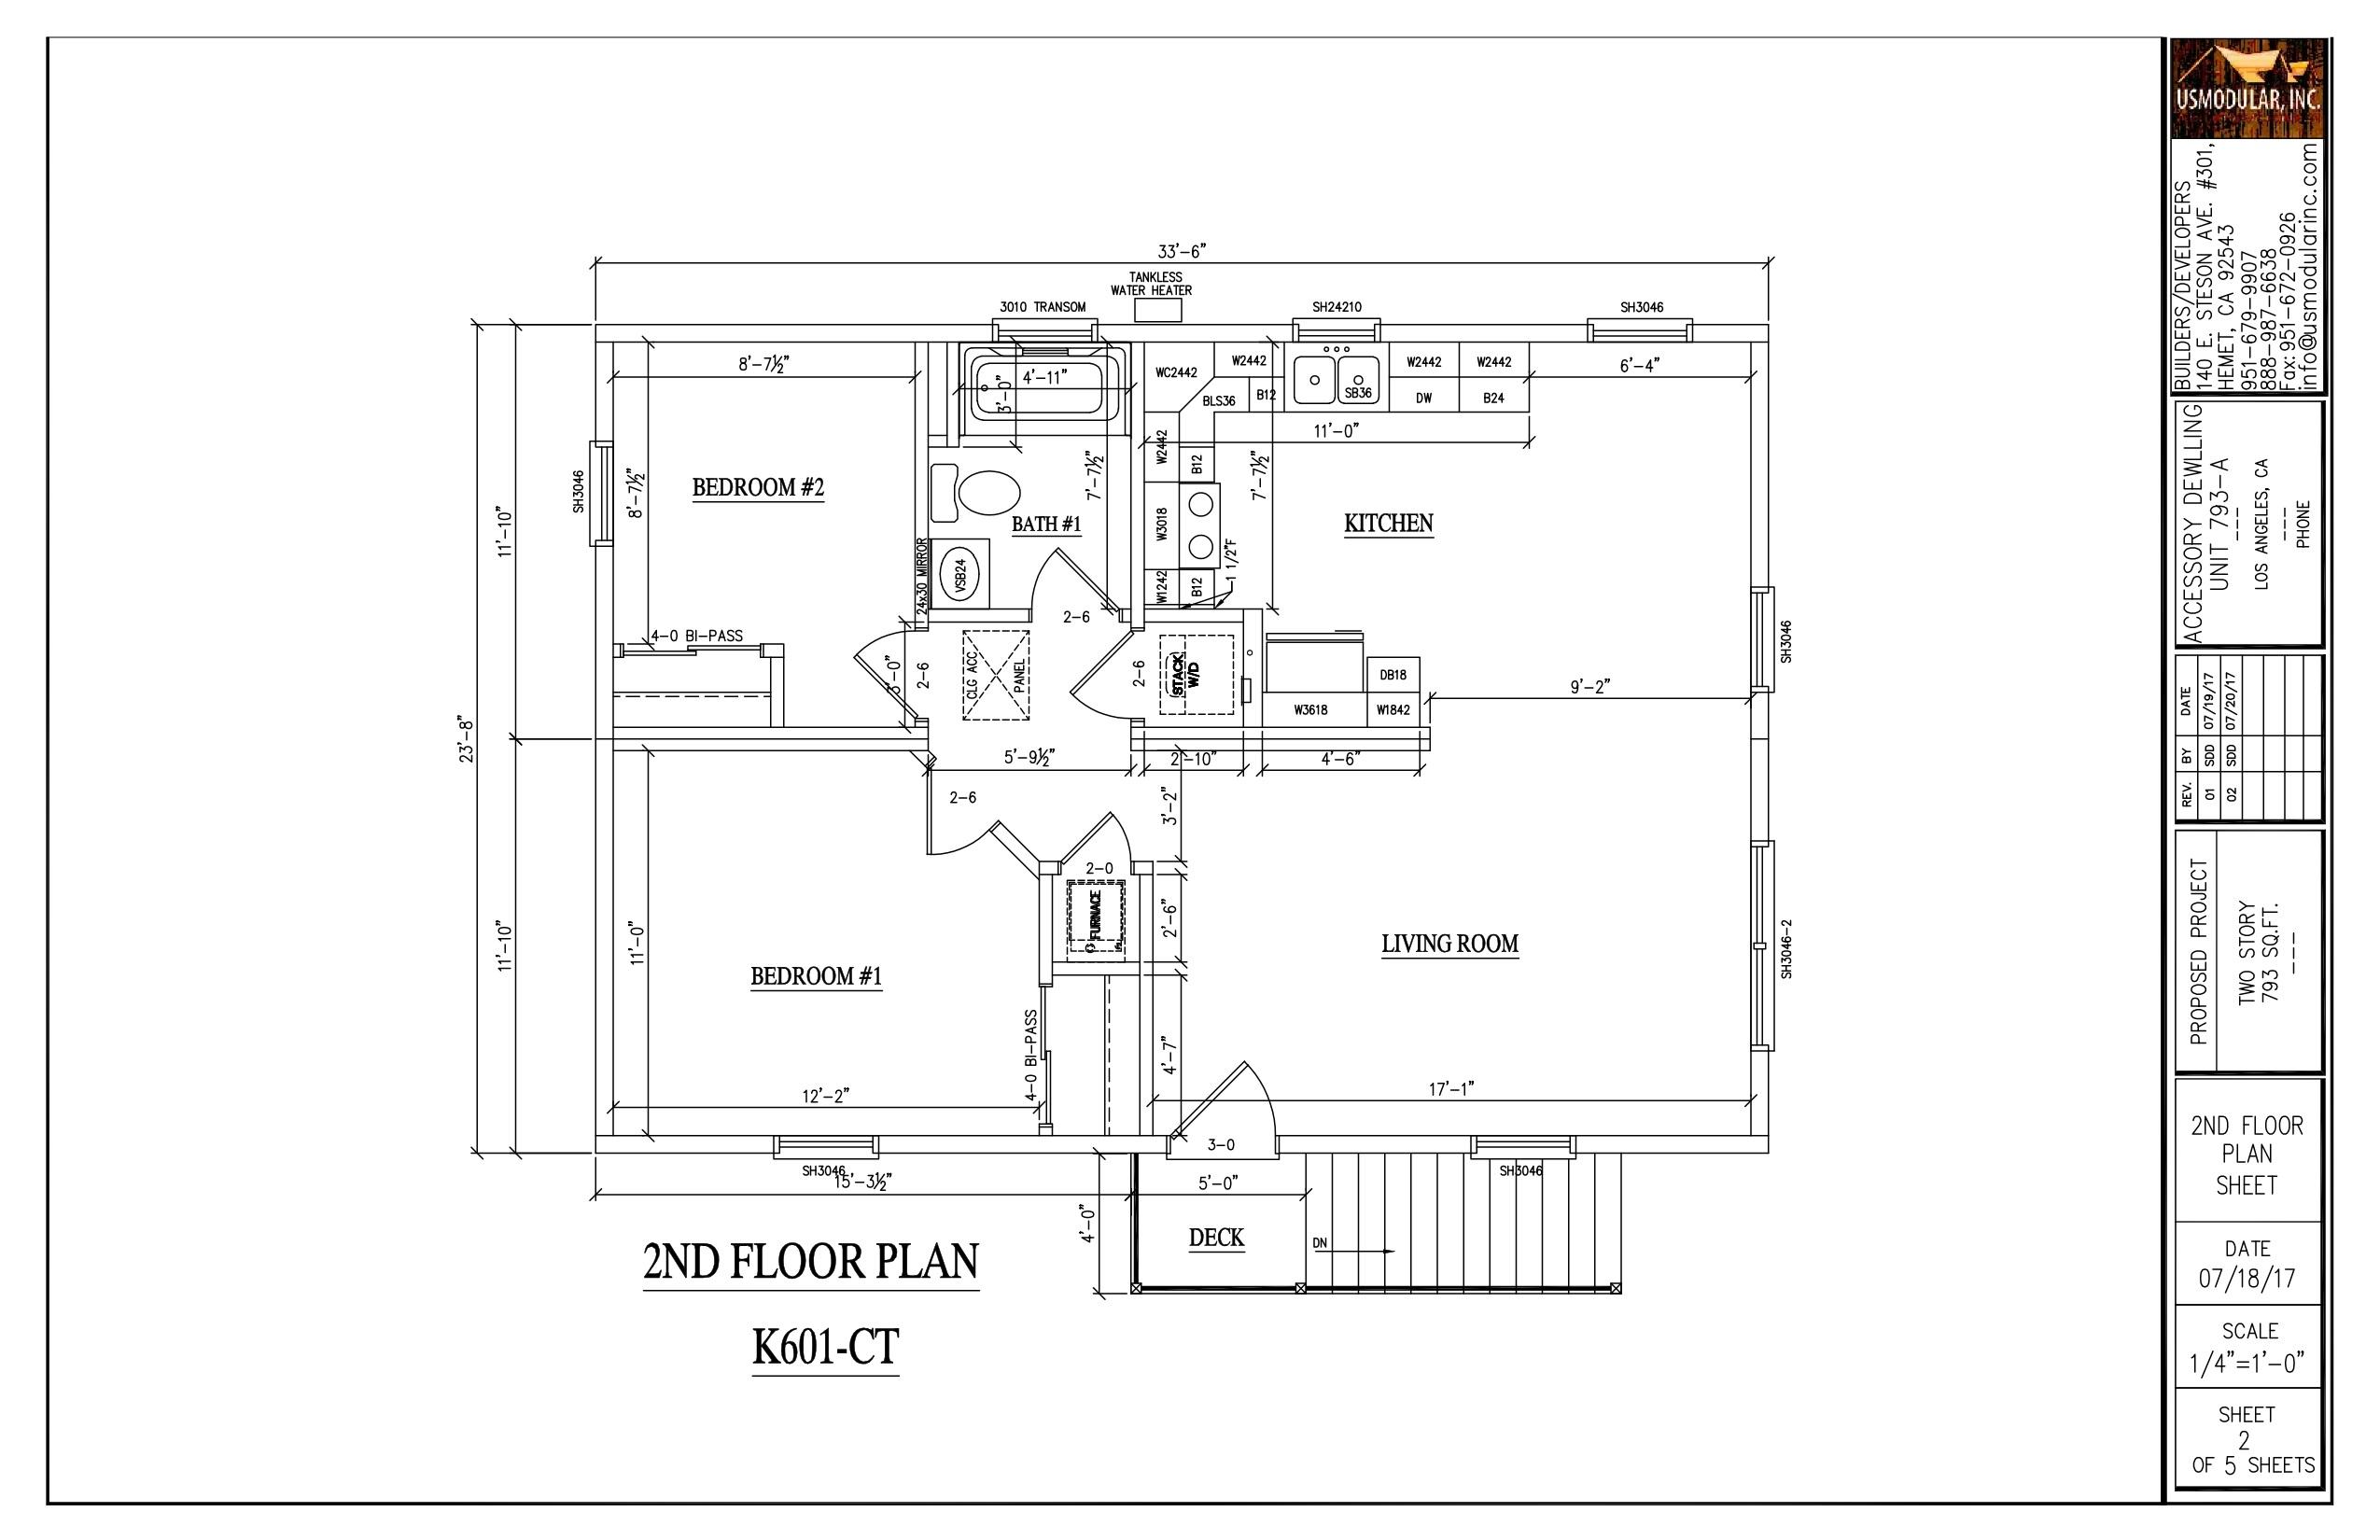 Tiny house floor plans for Small house design 2nd floor